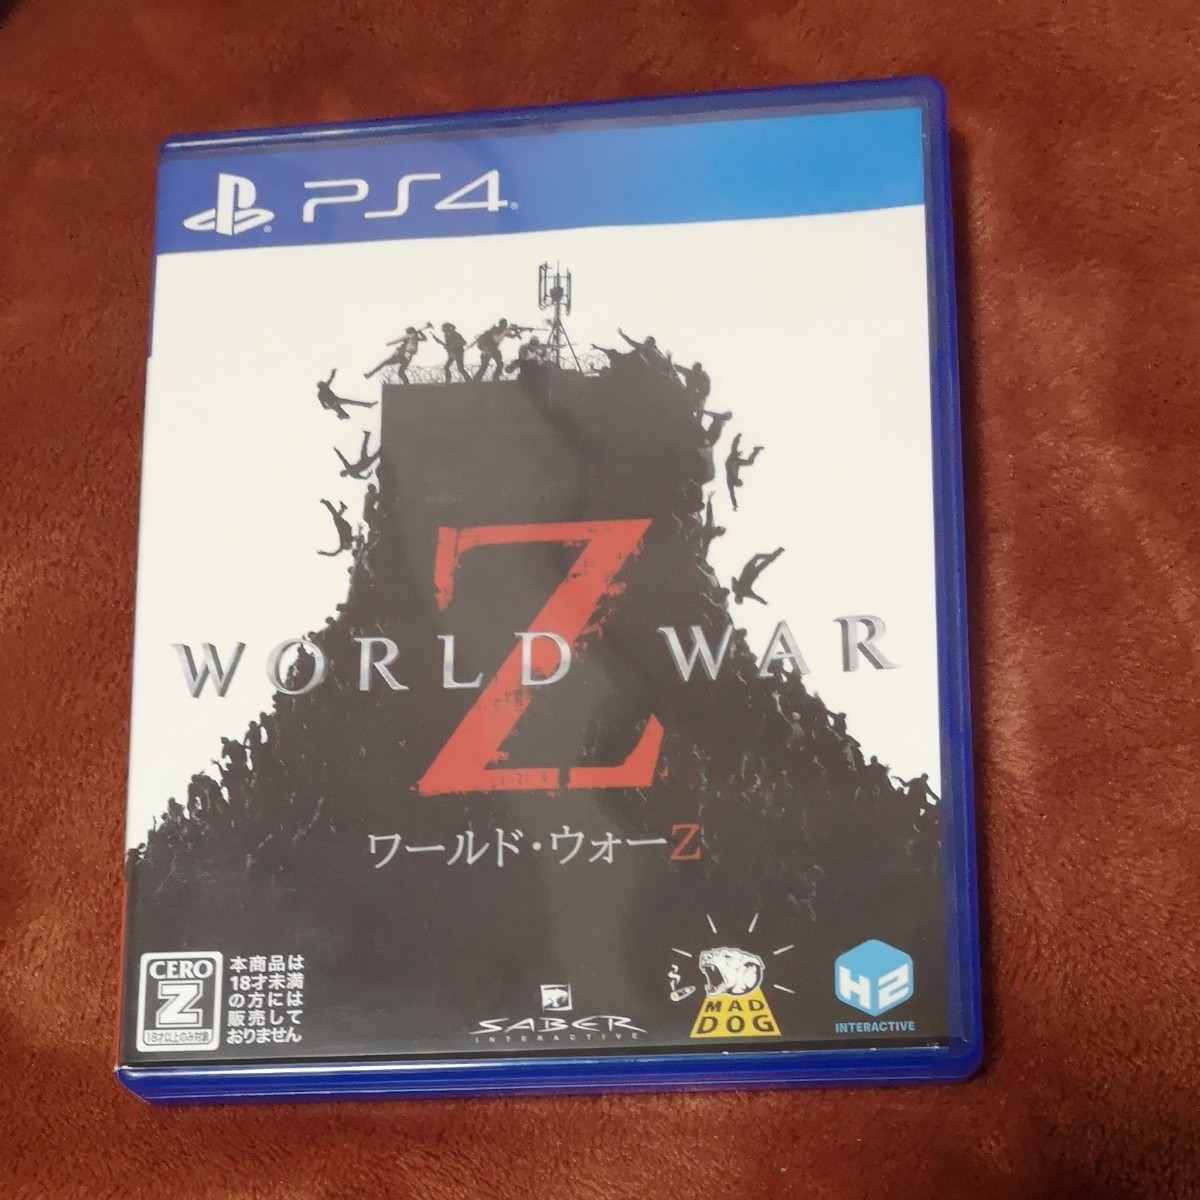 【PS4】 WORLD WAR Z PS4 ワールドウォーZ PS4ソフト